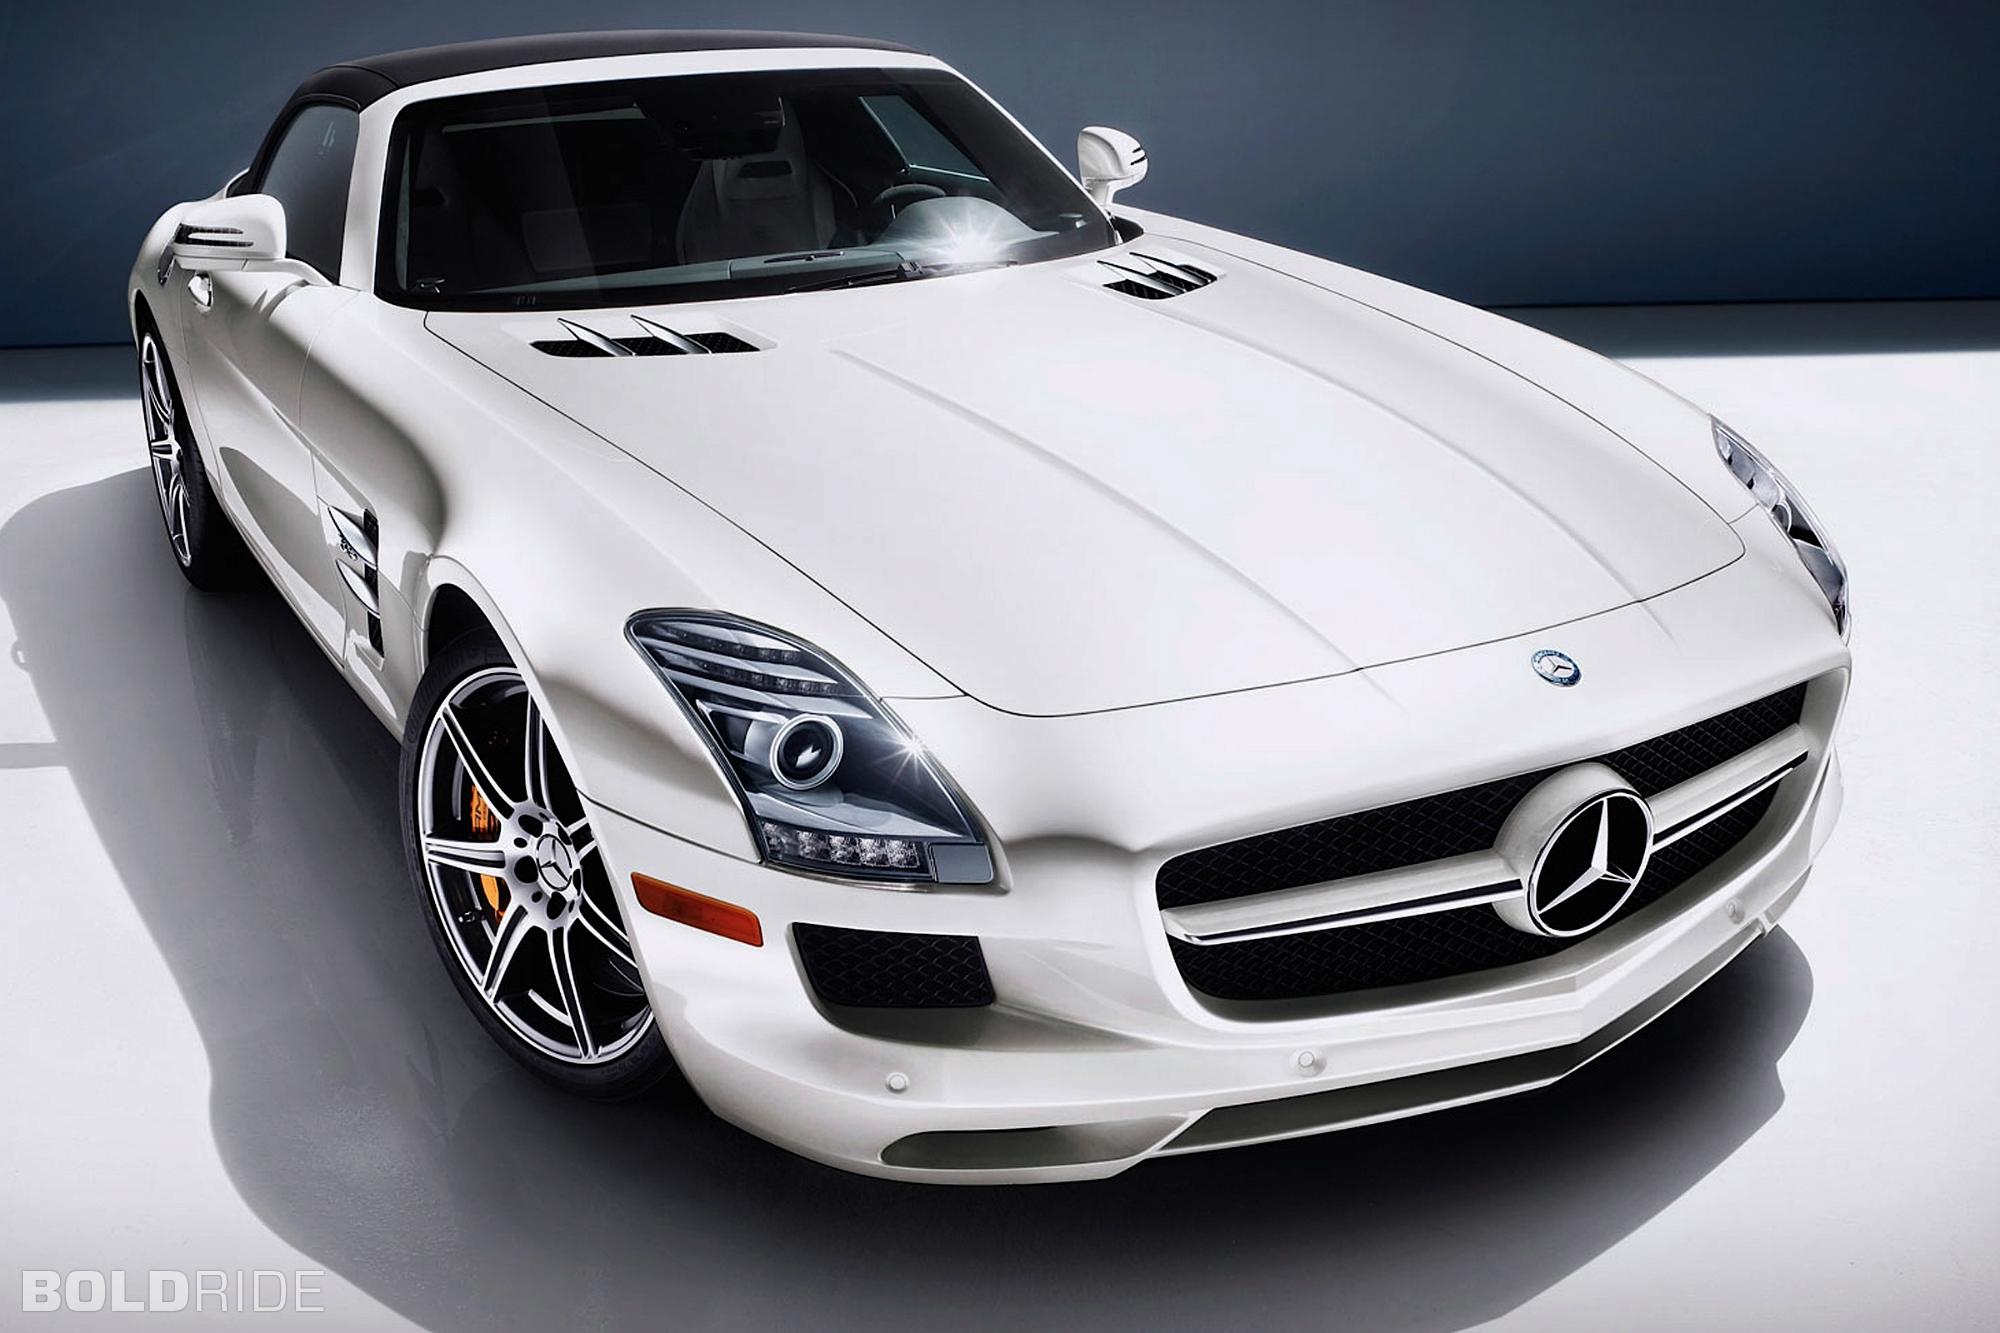 mercedes-benz-sls-amg-roadster.2000x1333.Jun-22-2012_11.02.00.590040.jpg